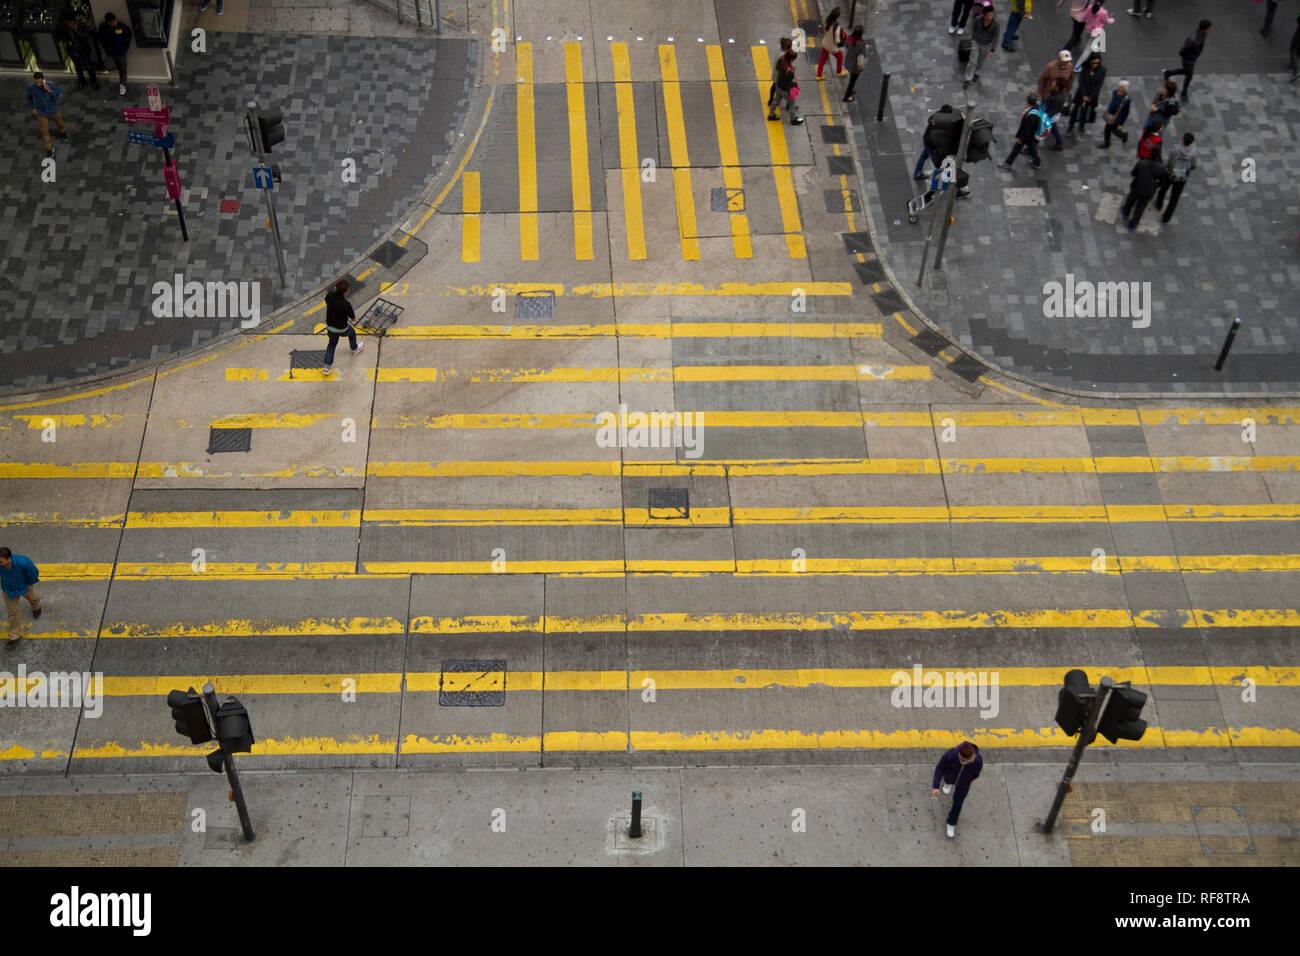 High view down to street crosing yellow markings Hong Kong - Stock Image